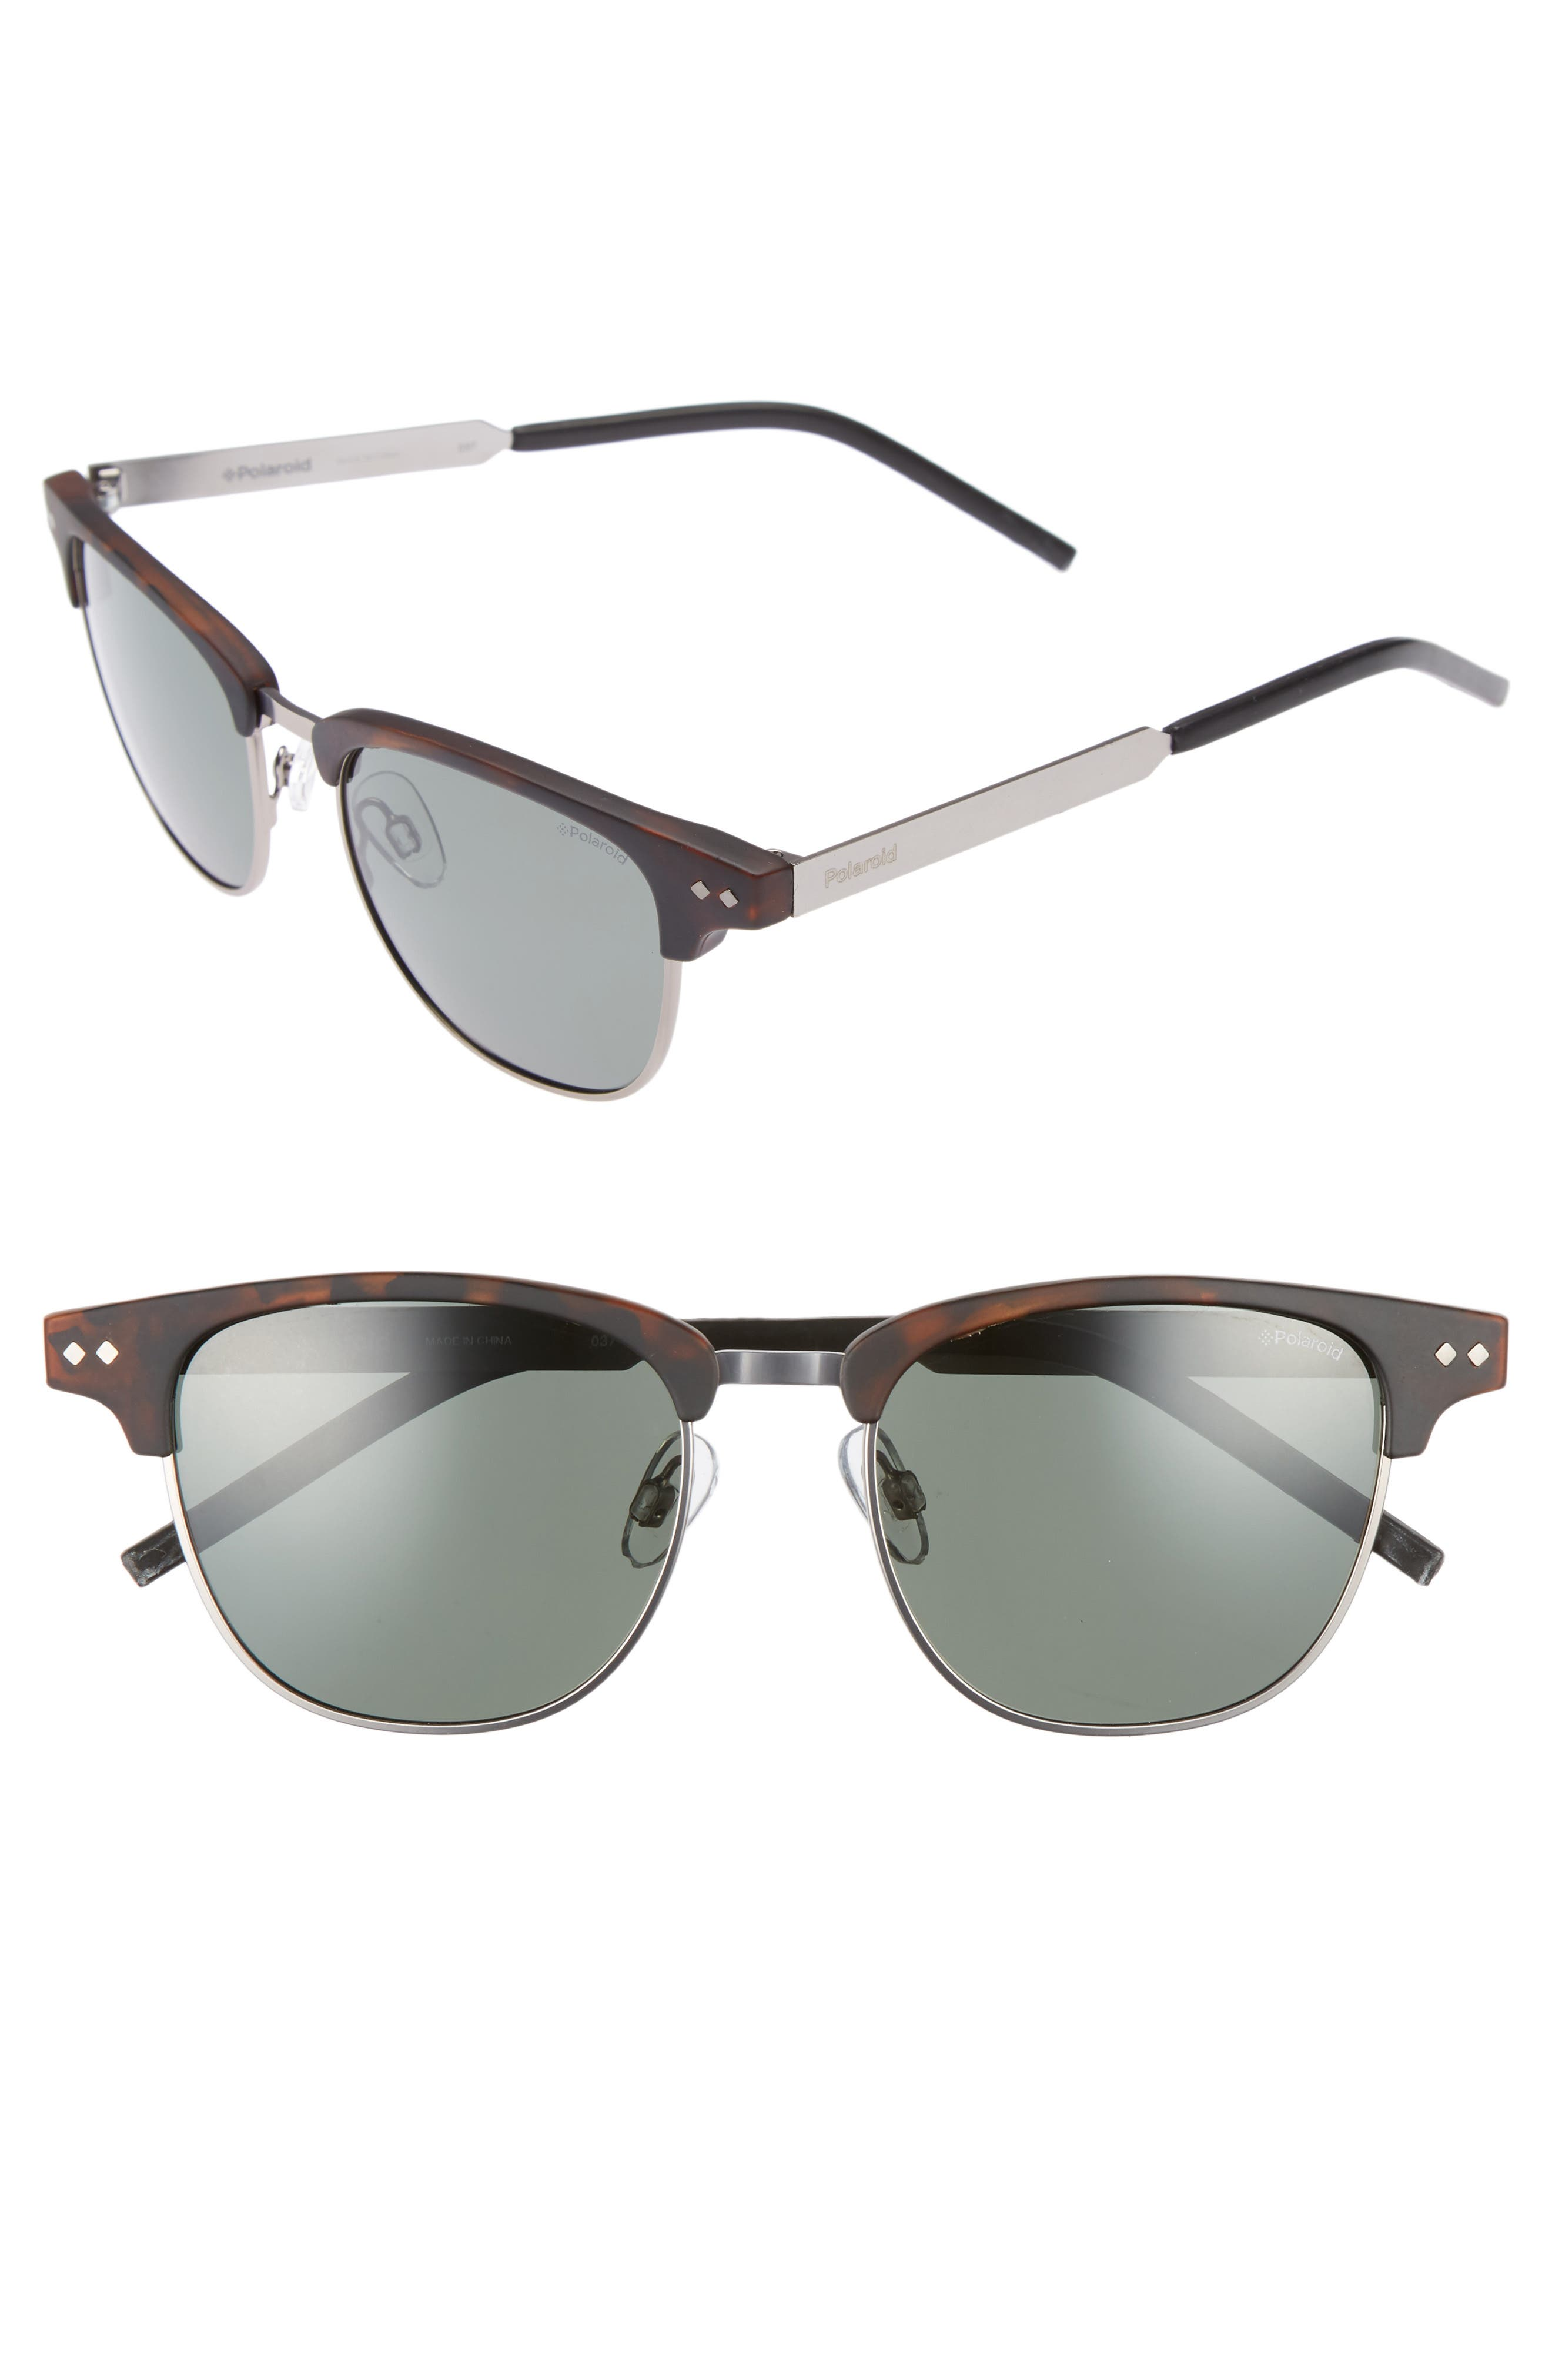 51mm Polarized Cat Eye Sunglasses,                             Main thumbnail 1, color,                             Matte Havana